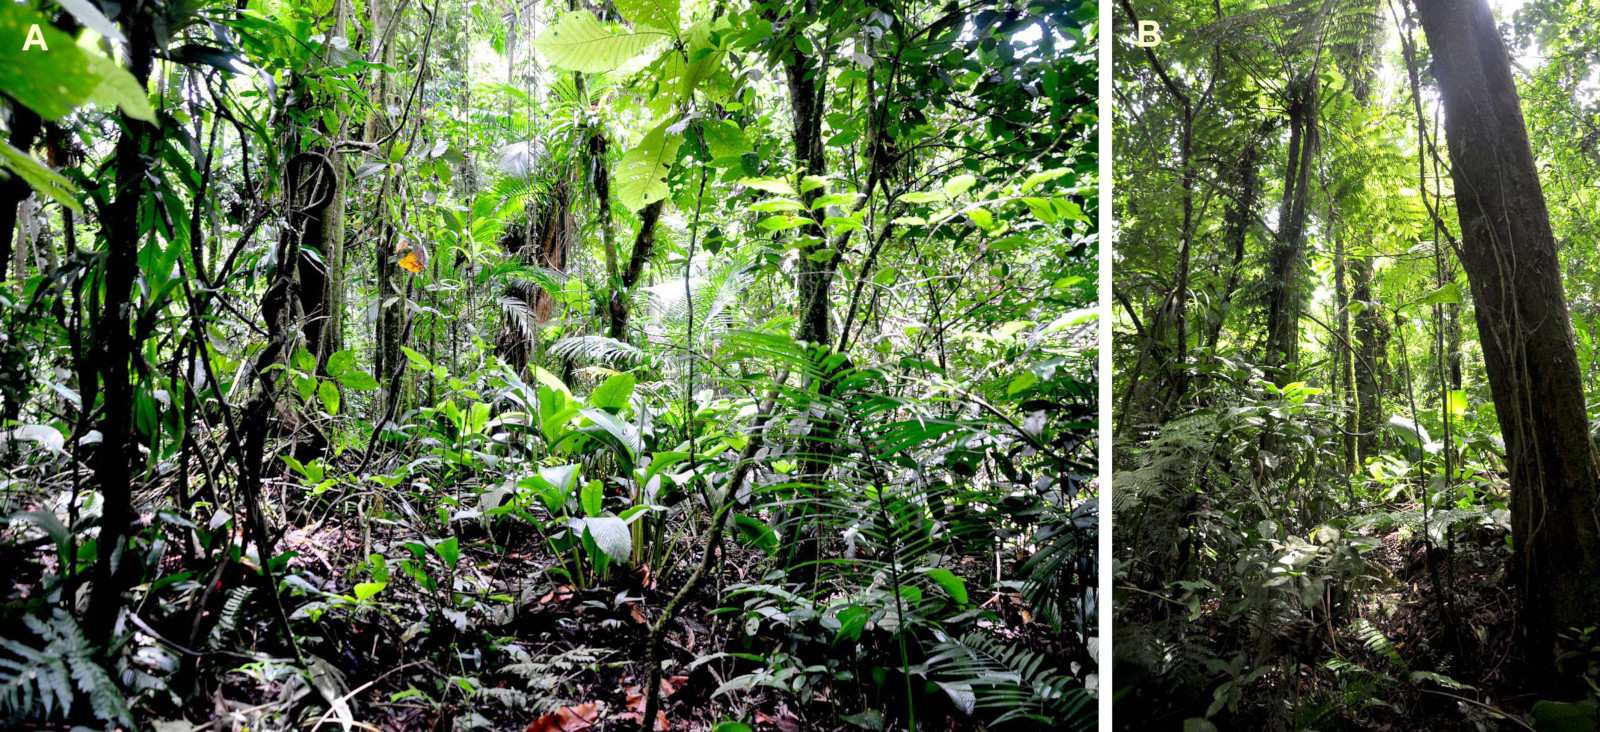 Wald am Fundort der Frösche